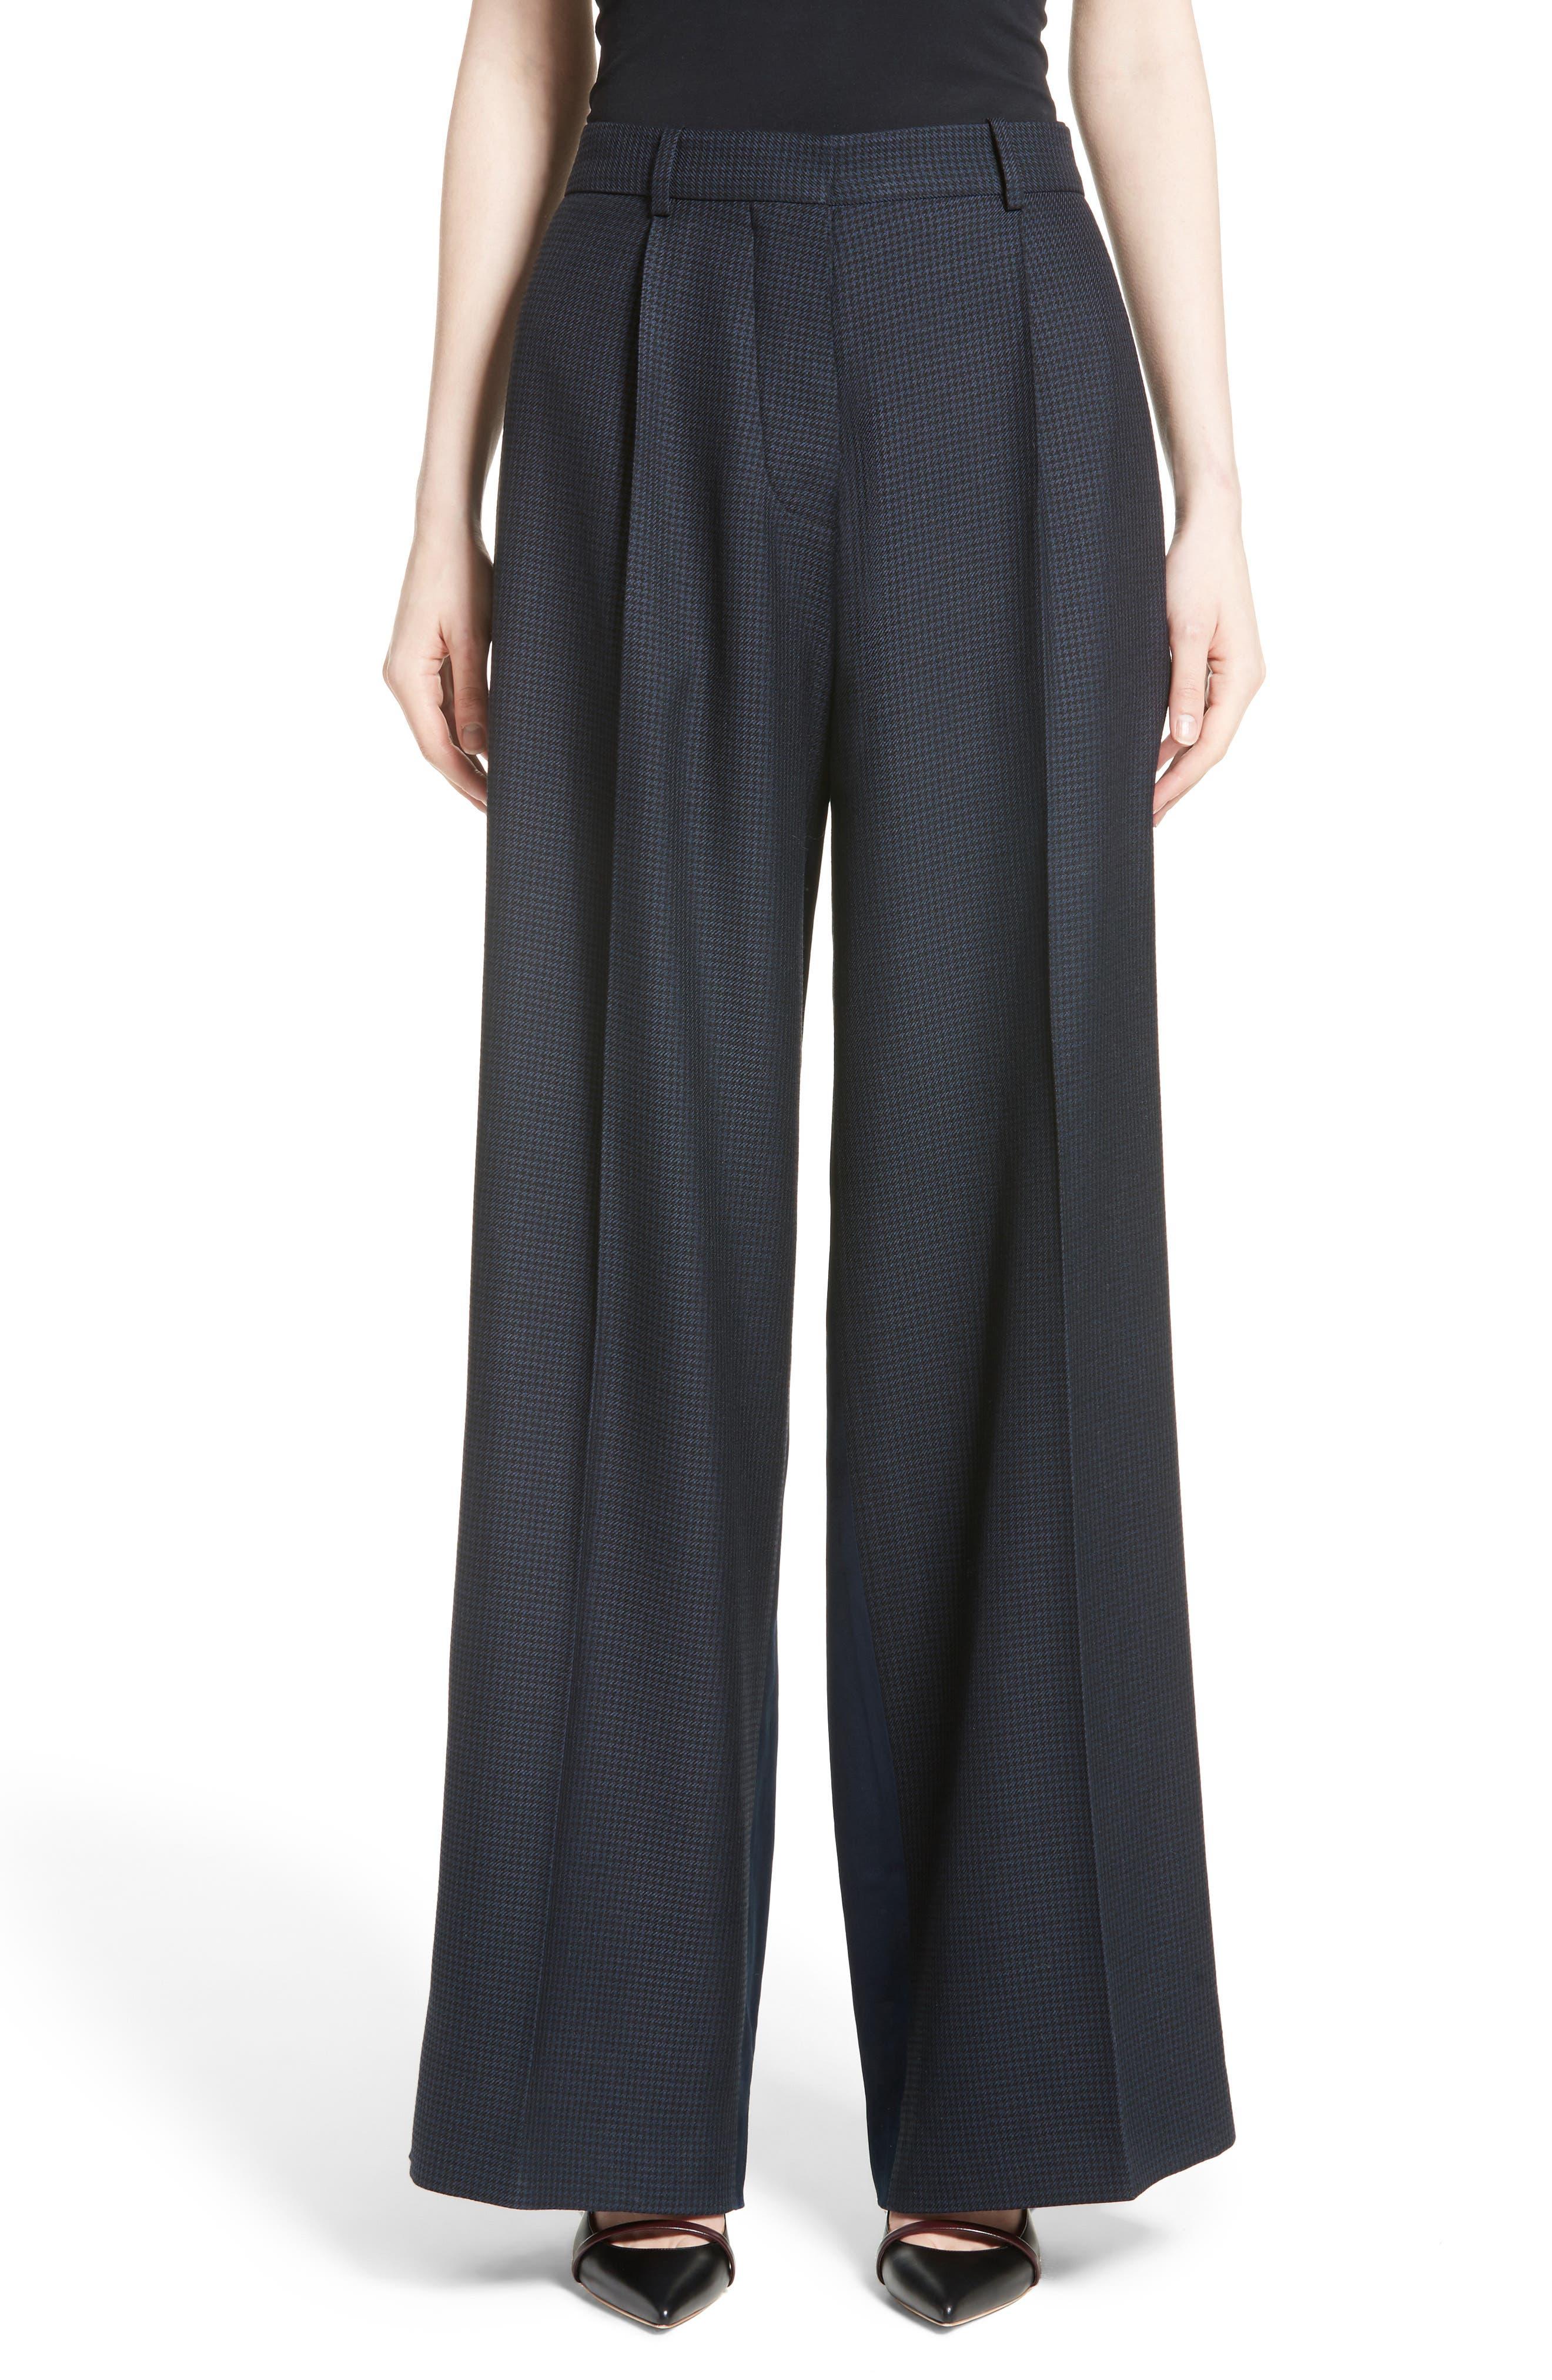 Victoria Beckham Houndstooth Wide Leg Pants